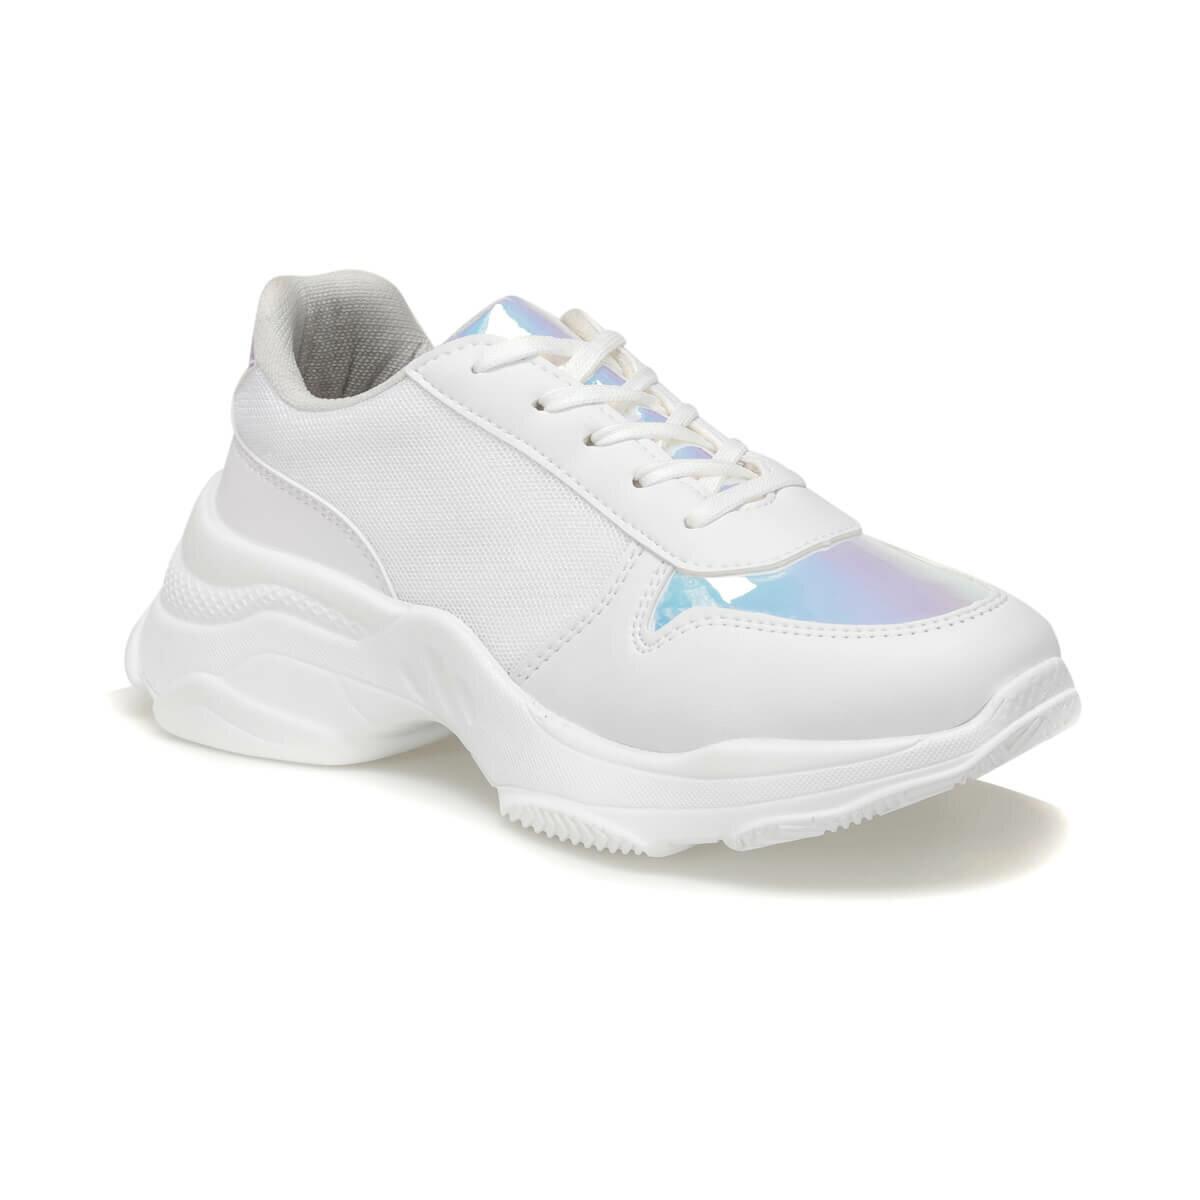 FLO 19SF-1619 White Women 'S Sneaker BUTIGO